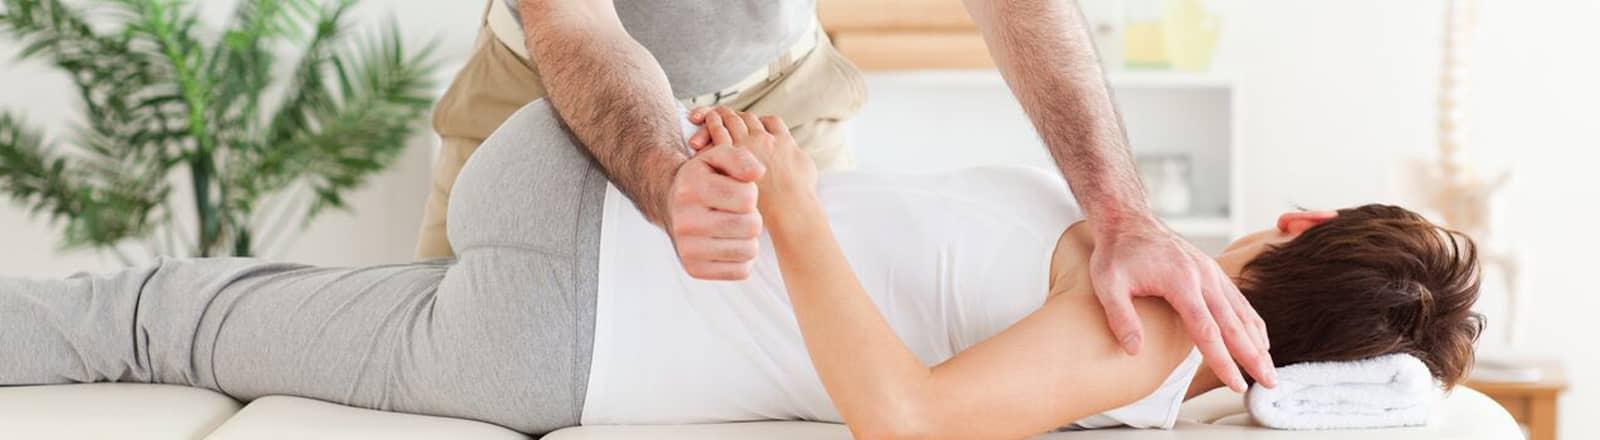 osteopatia deportiva Logroño